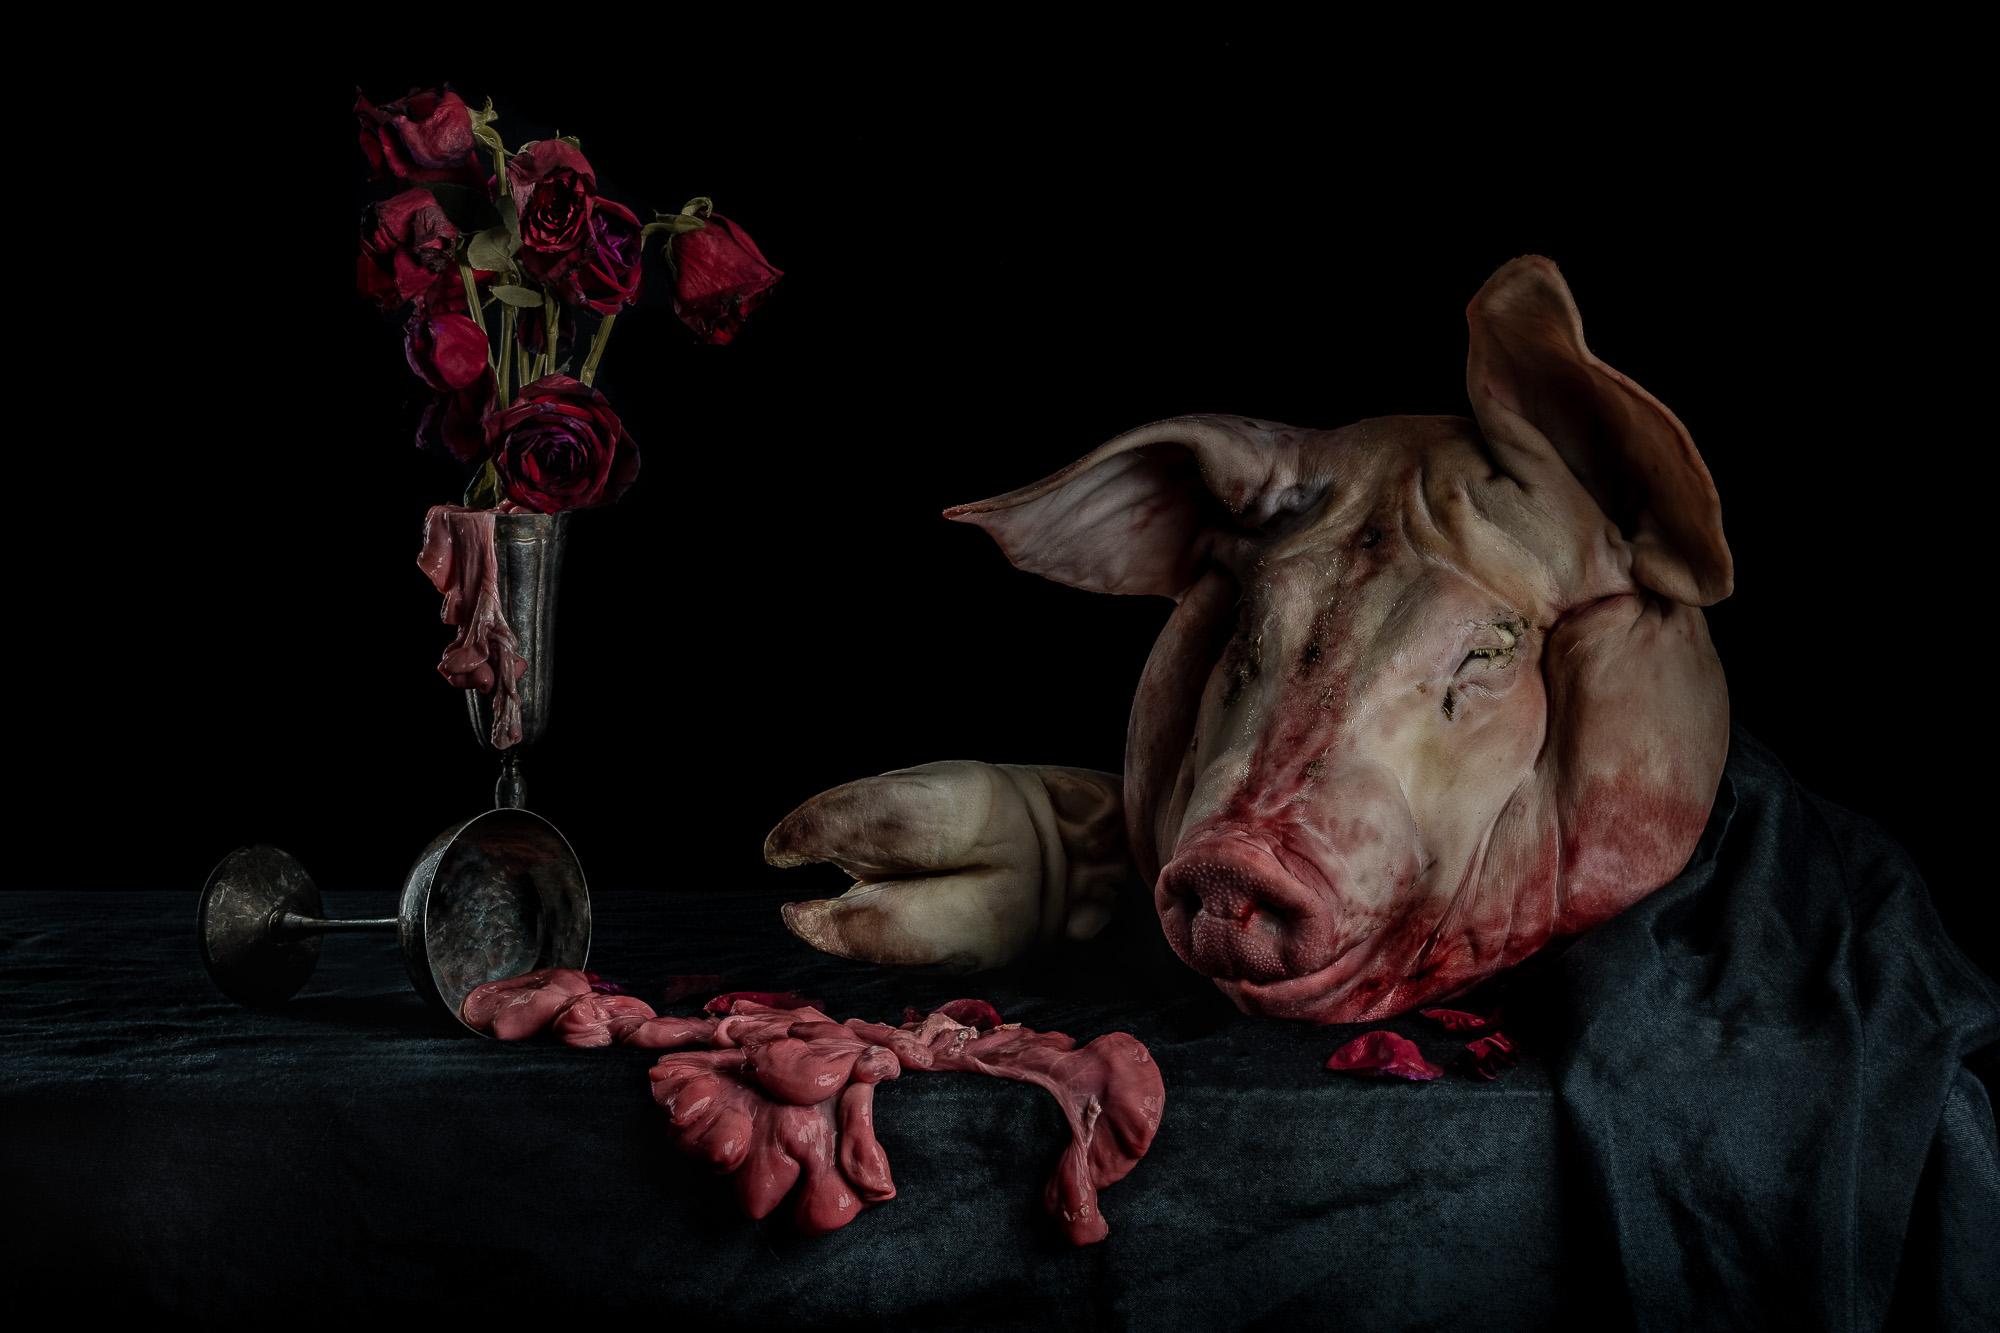 neal-auch-still-life-with-pig-head-2.jpg